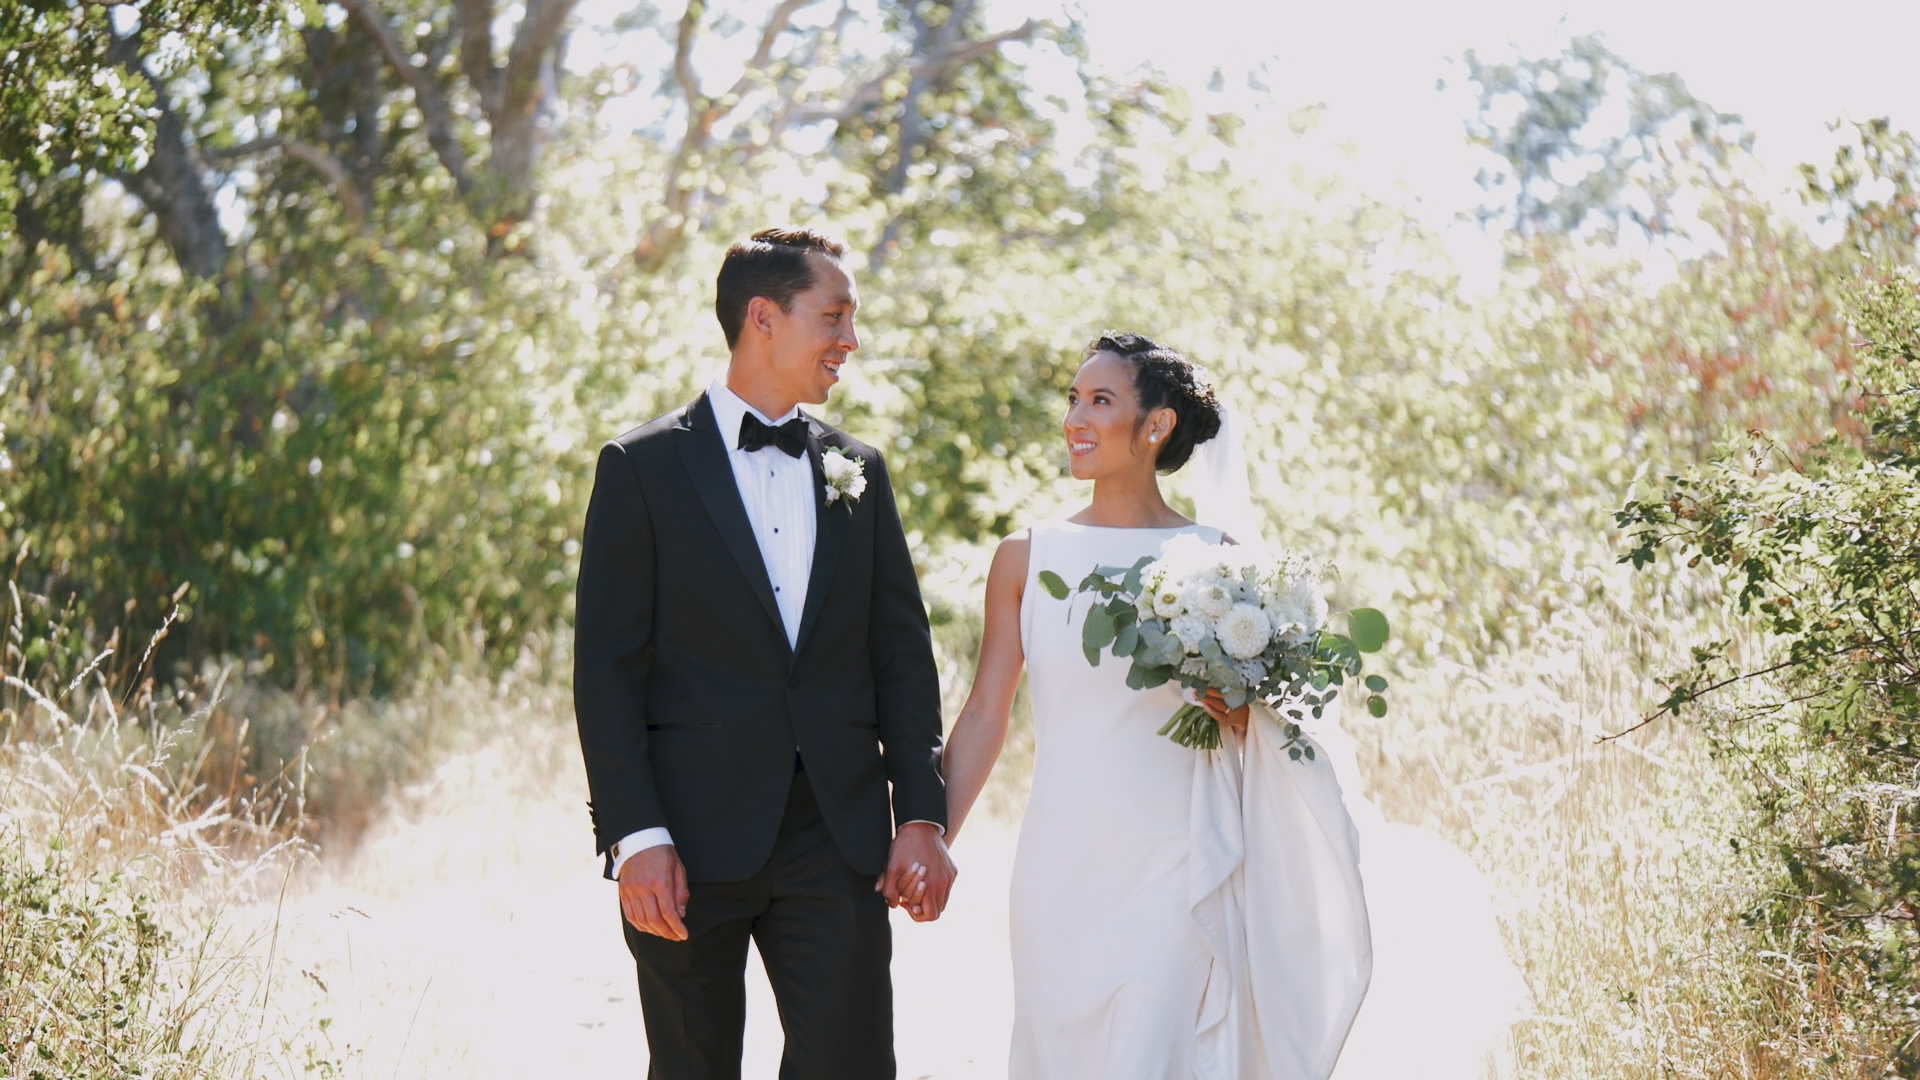 Stephanie + Steven   Victoria, Canada   Bride's Family Home